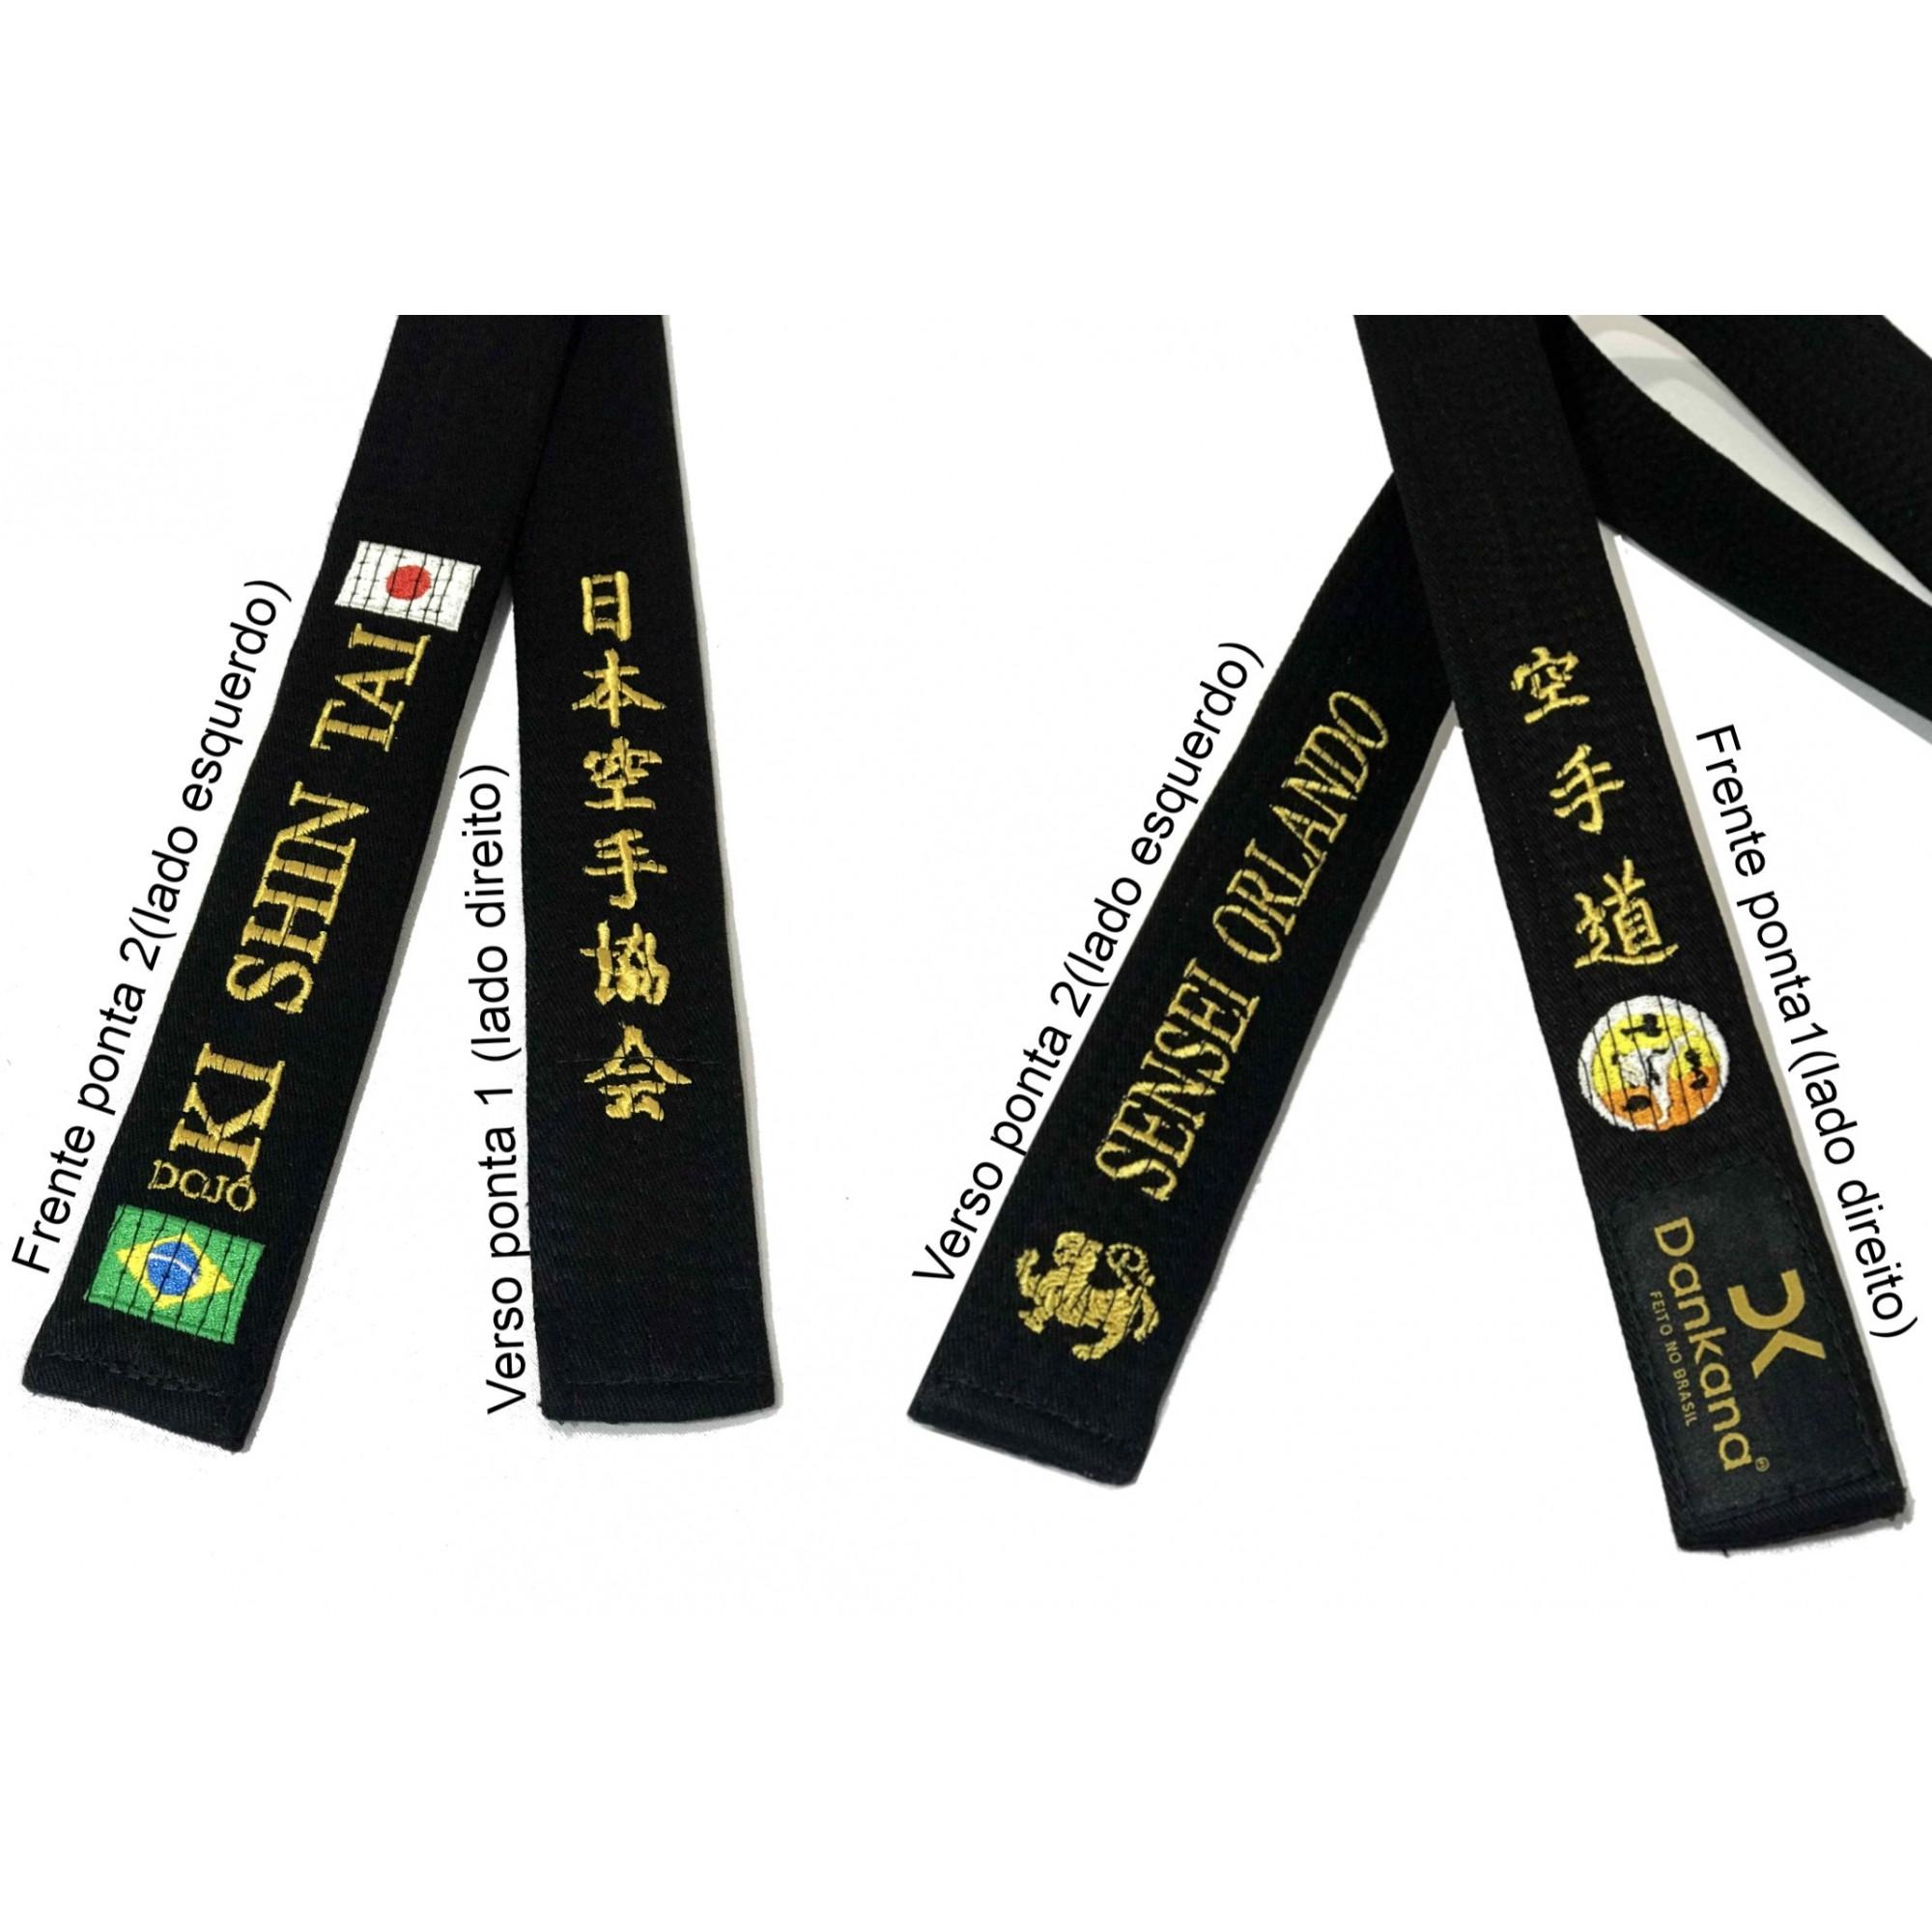 Faixa Karate Especial Bordada Frente e Verso